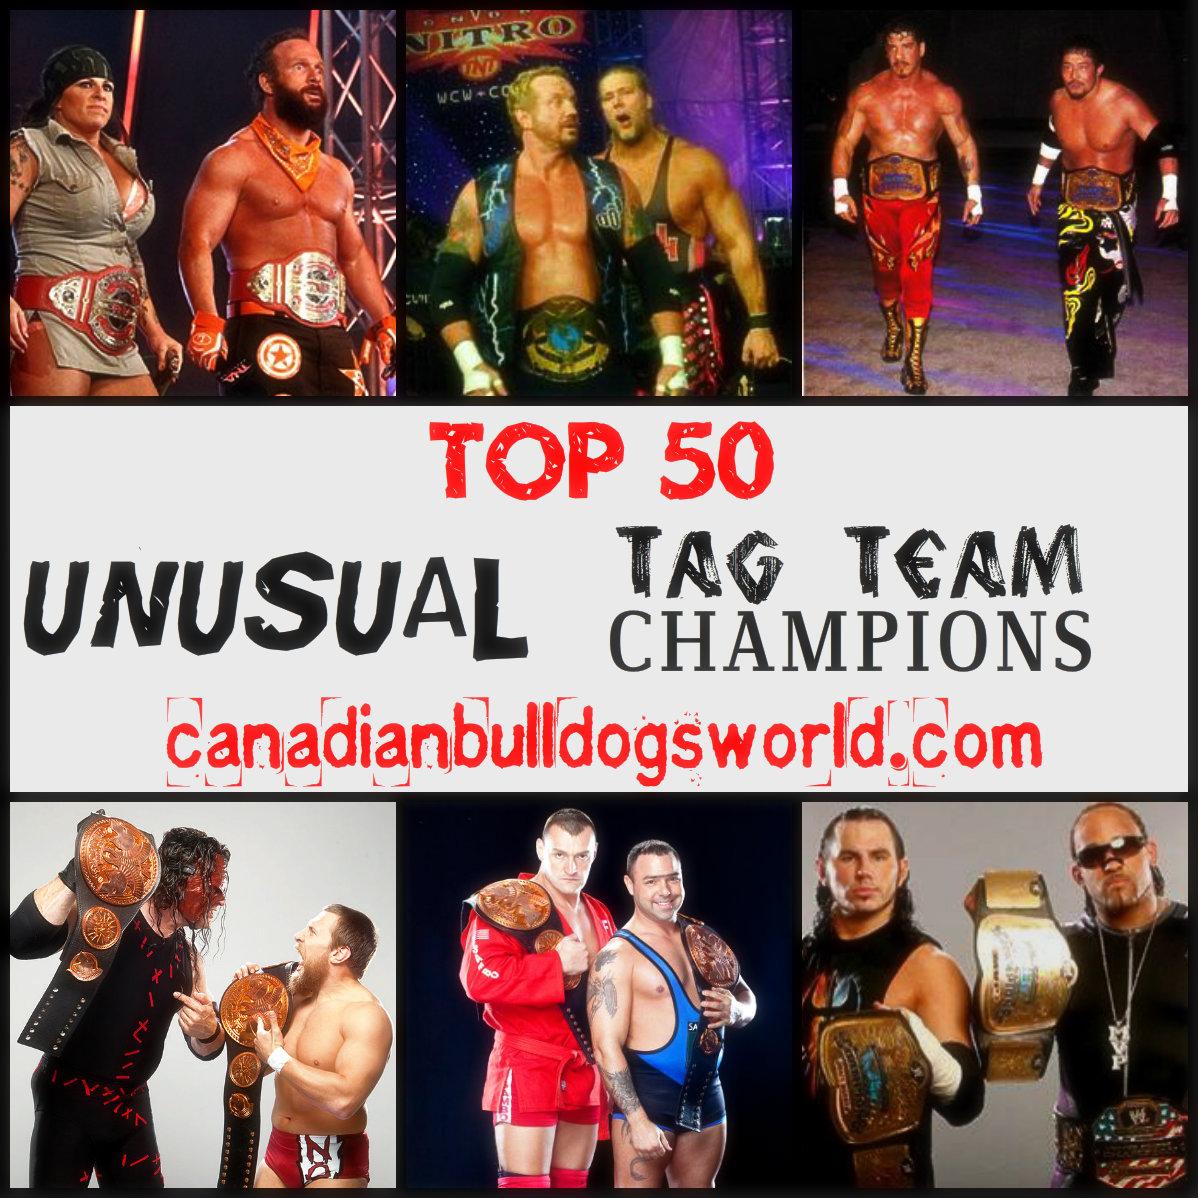 Top 50 Unusual Tag Team Champions